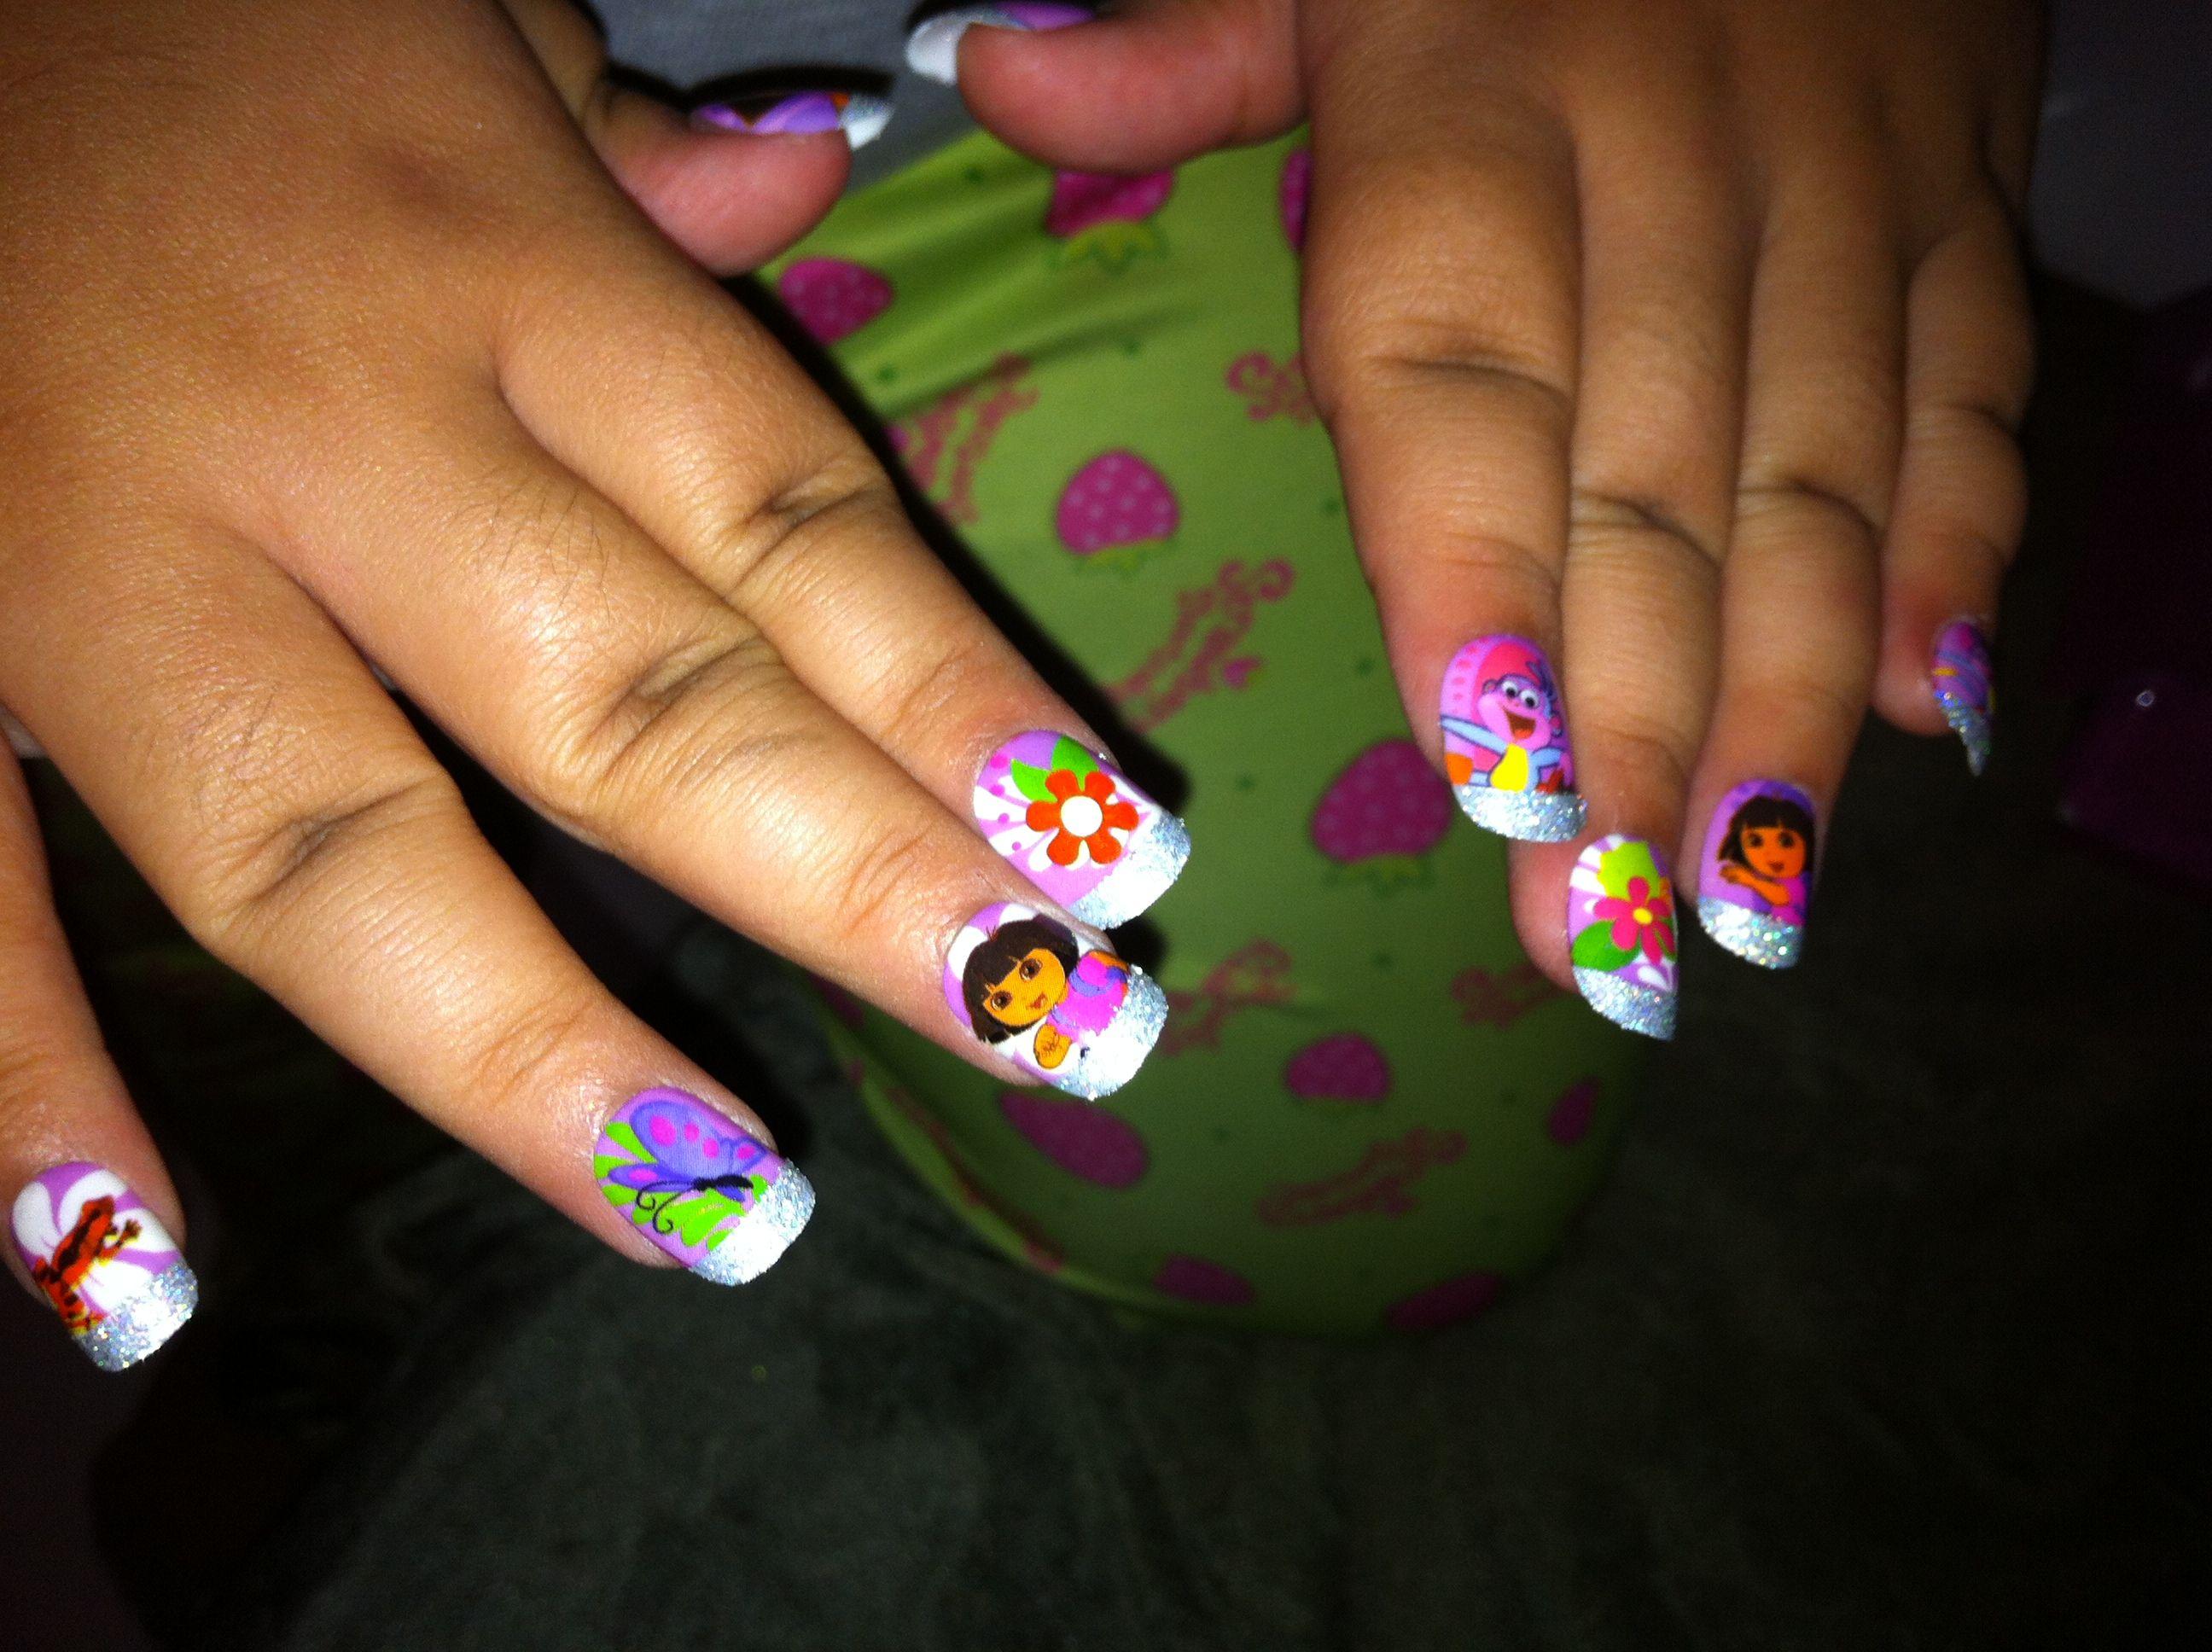 Awesome Dora Nails Nail Art Competition Idea Nails Pinterest